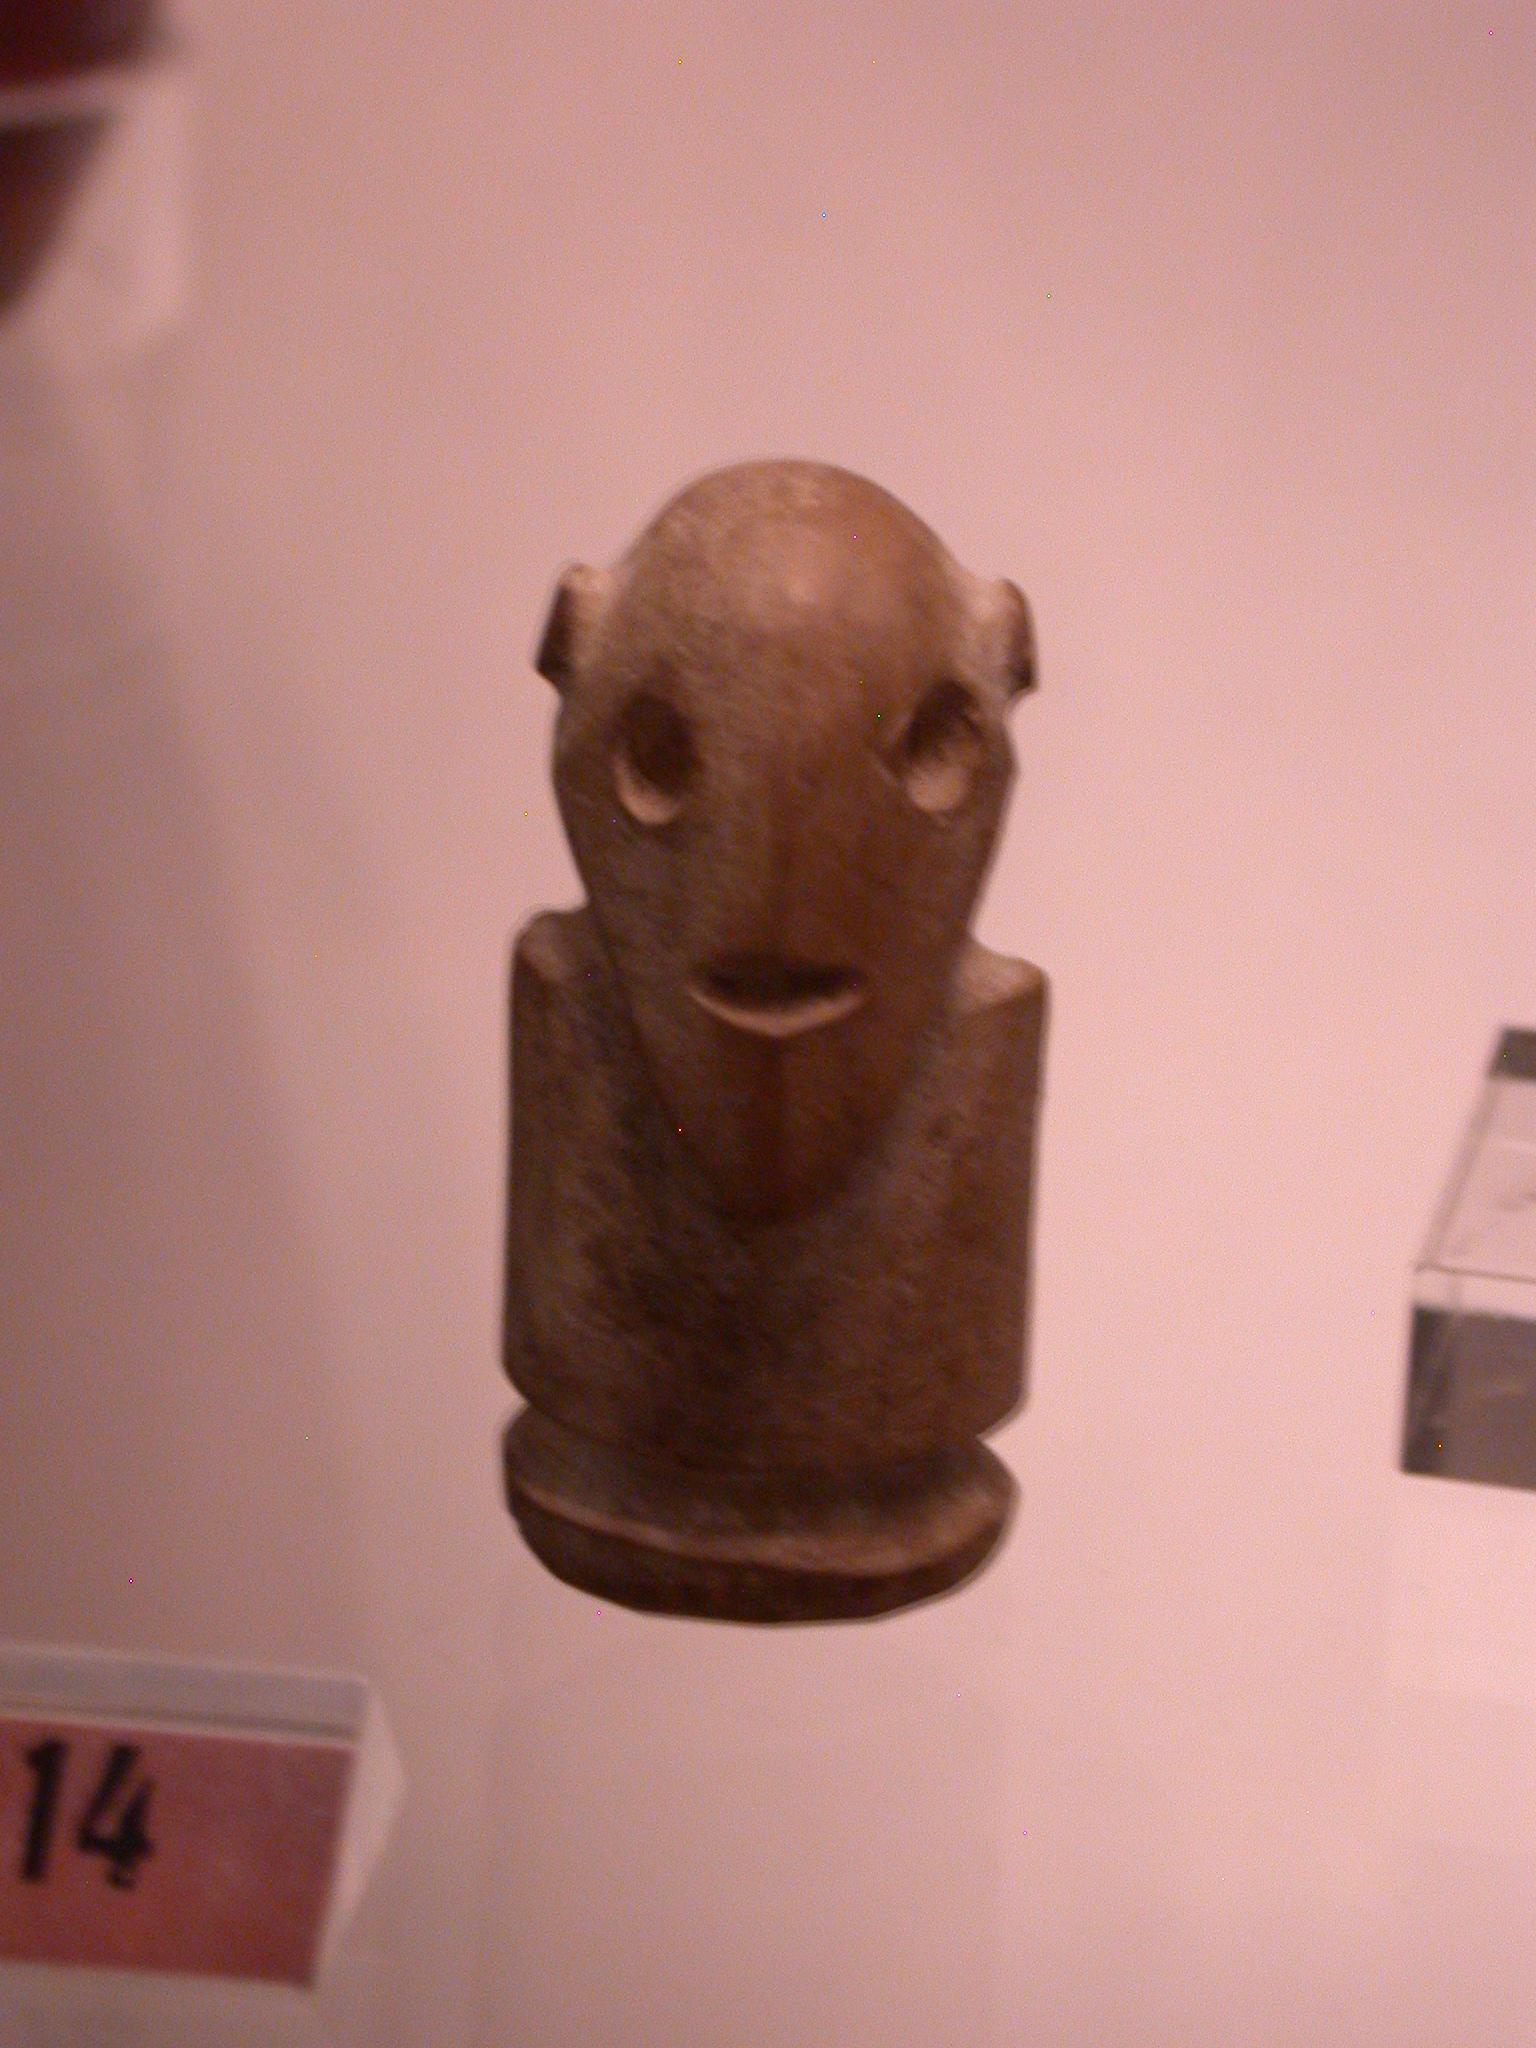 Figure of Man, Limestone, About 3500-3000 BCE, Egypt, in Fitzwilliam Museum, Cambridge, England